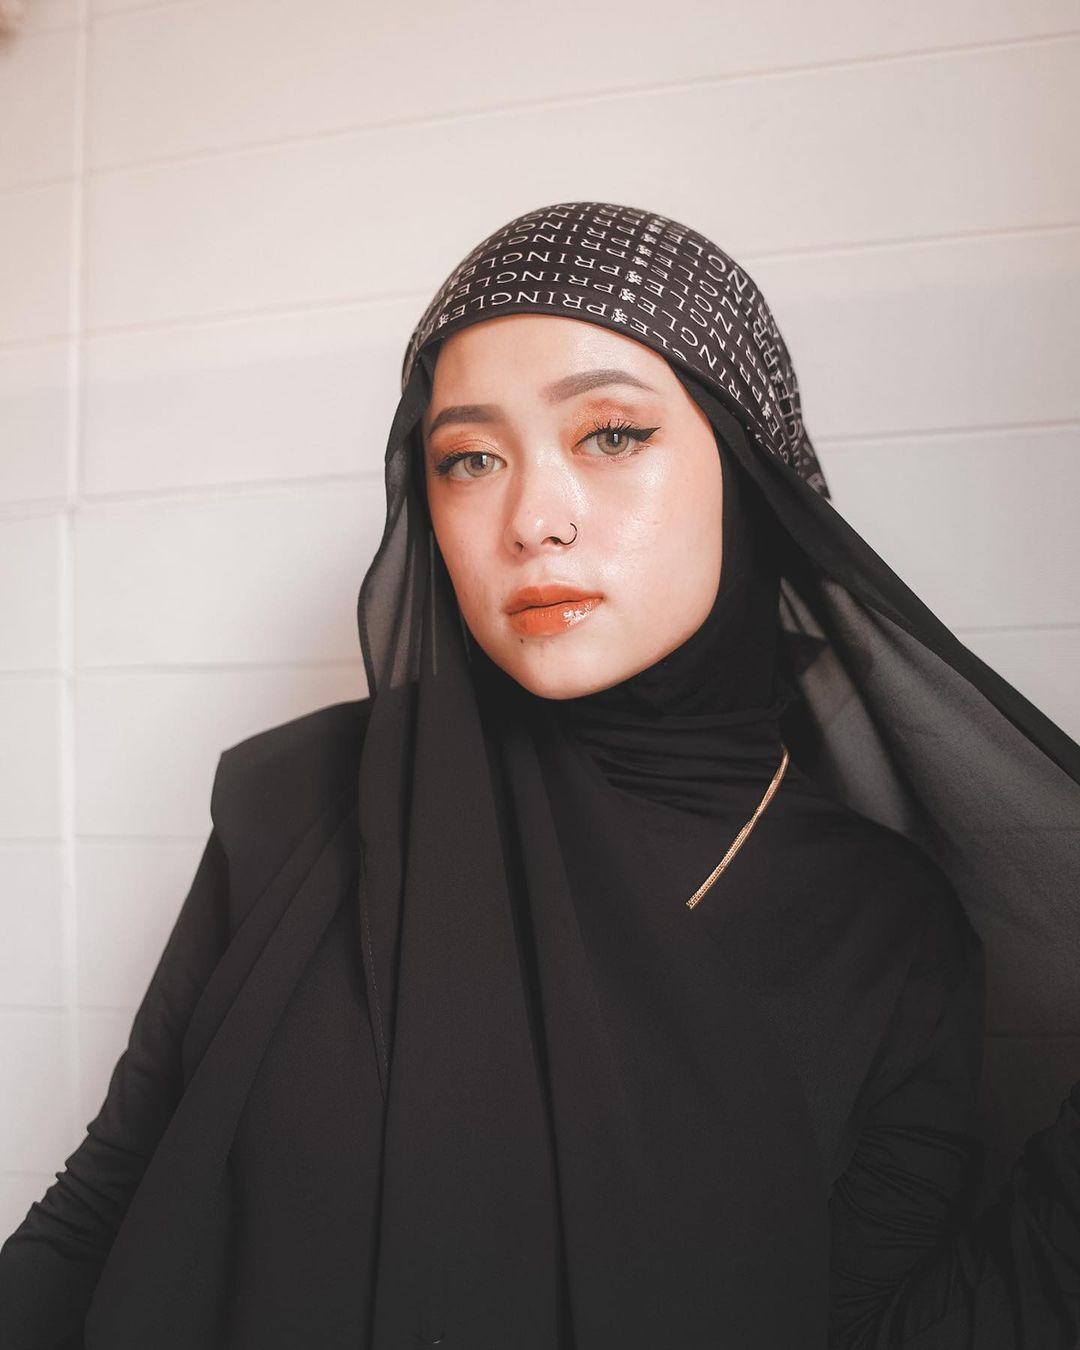 7 Ide Aksesori Hijab a La Selebgram Indonesia